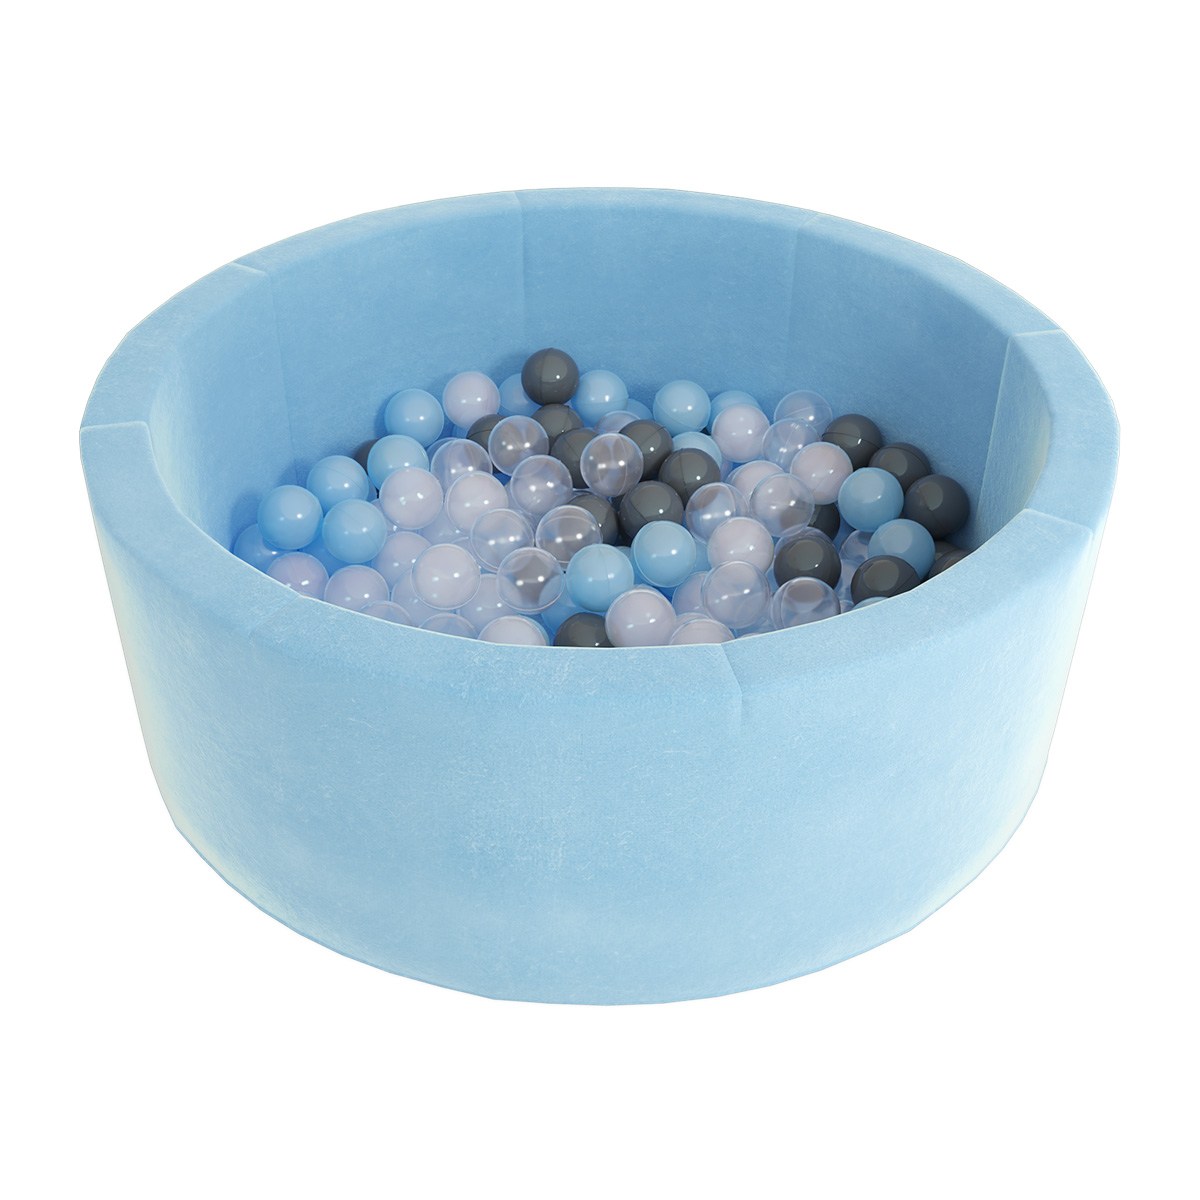 Купить Детский сухой бассейн Romana Airpool Max голубой, без шаров, Romana (Романа)